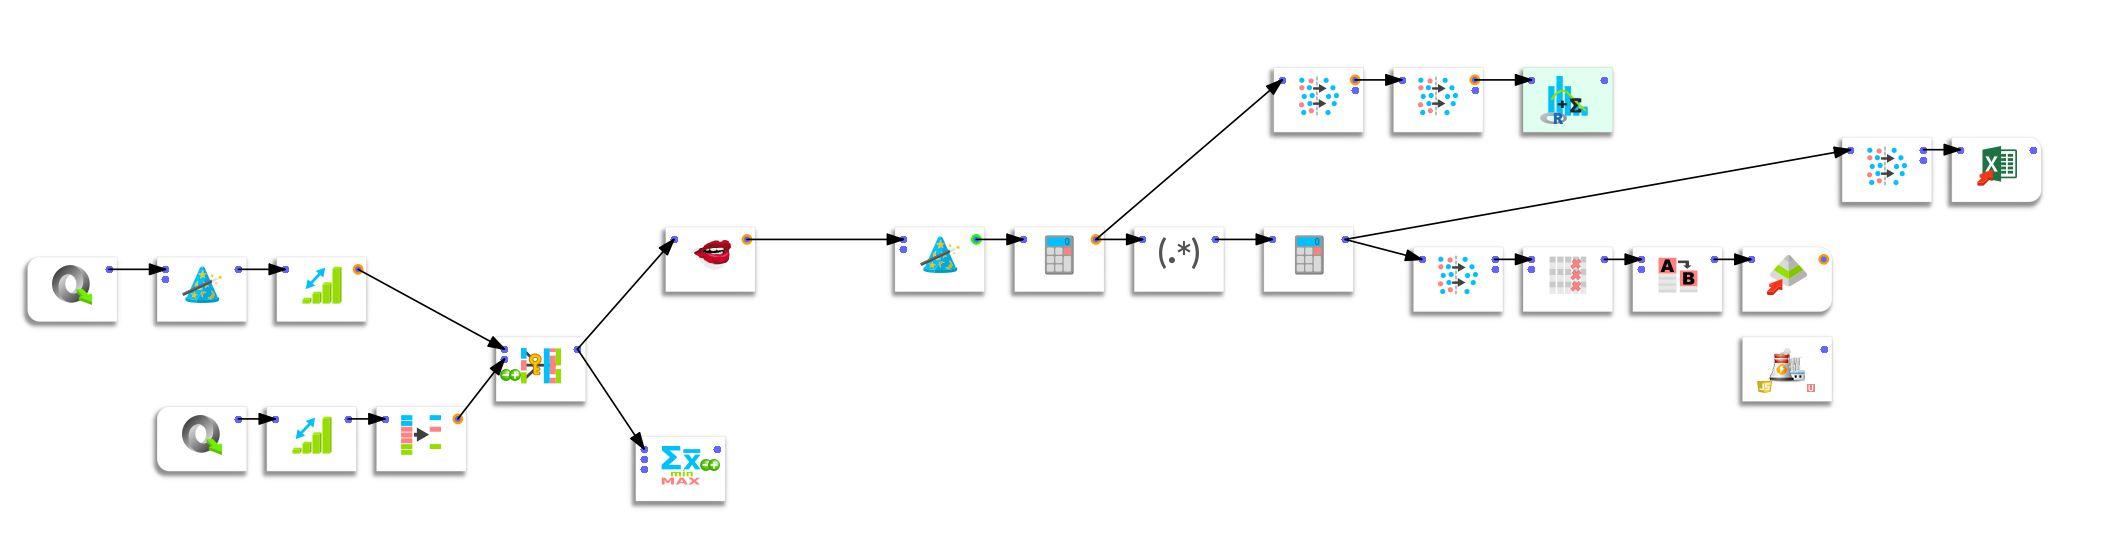 data preparation Linkedin dataset Anatella